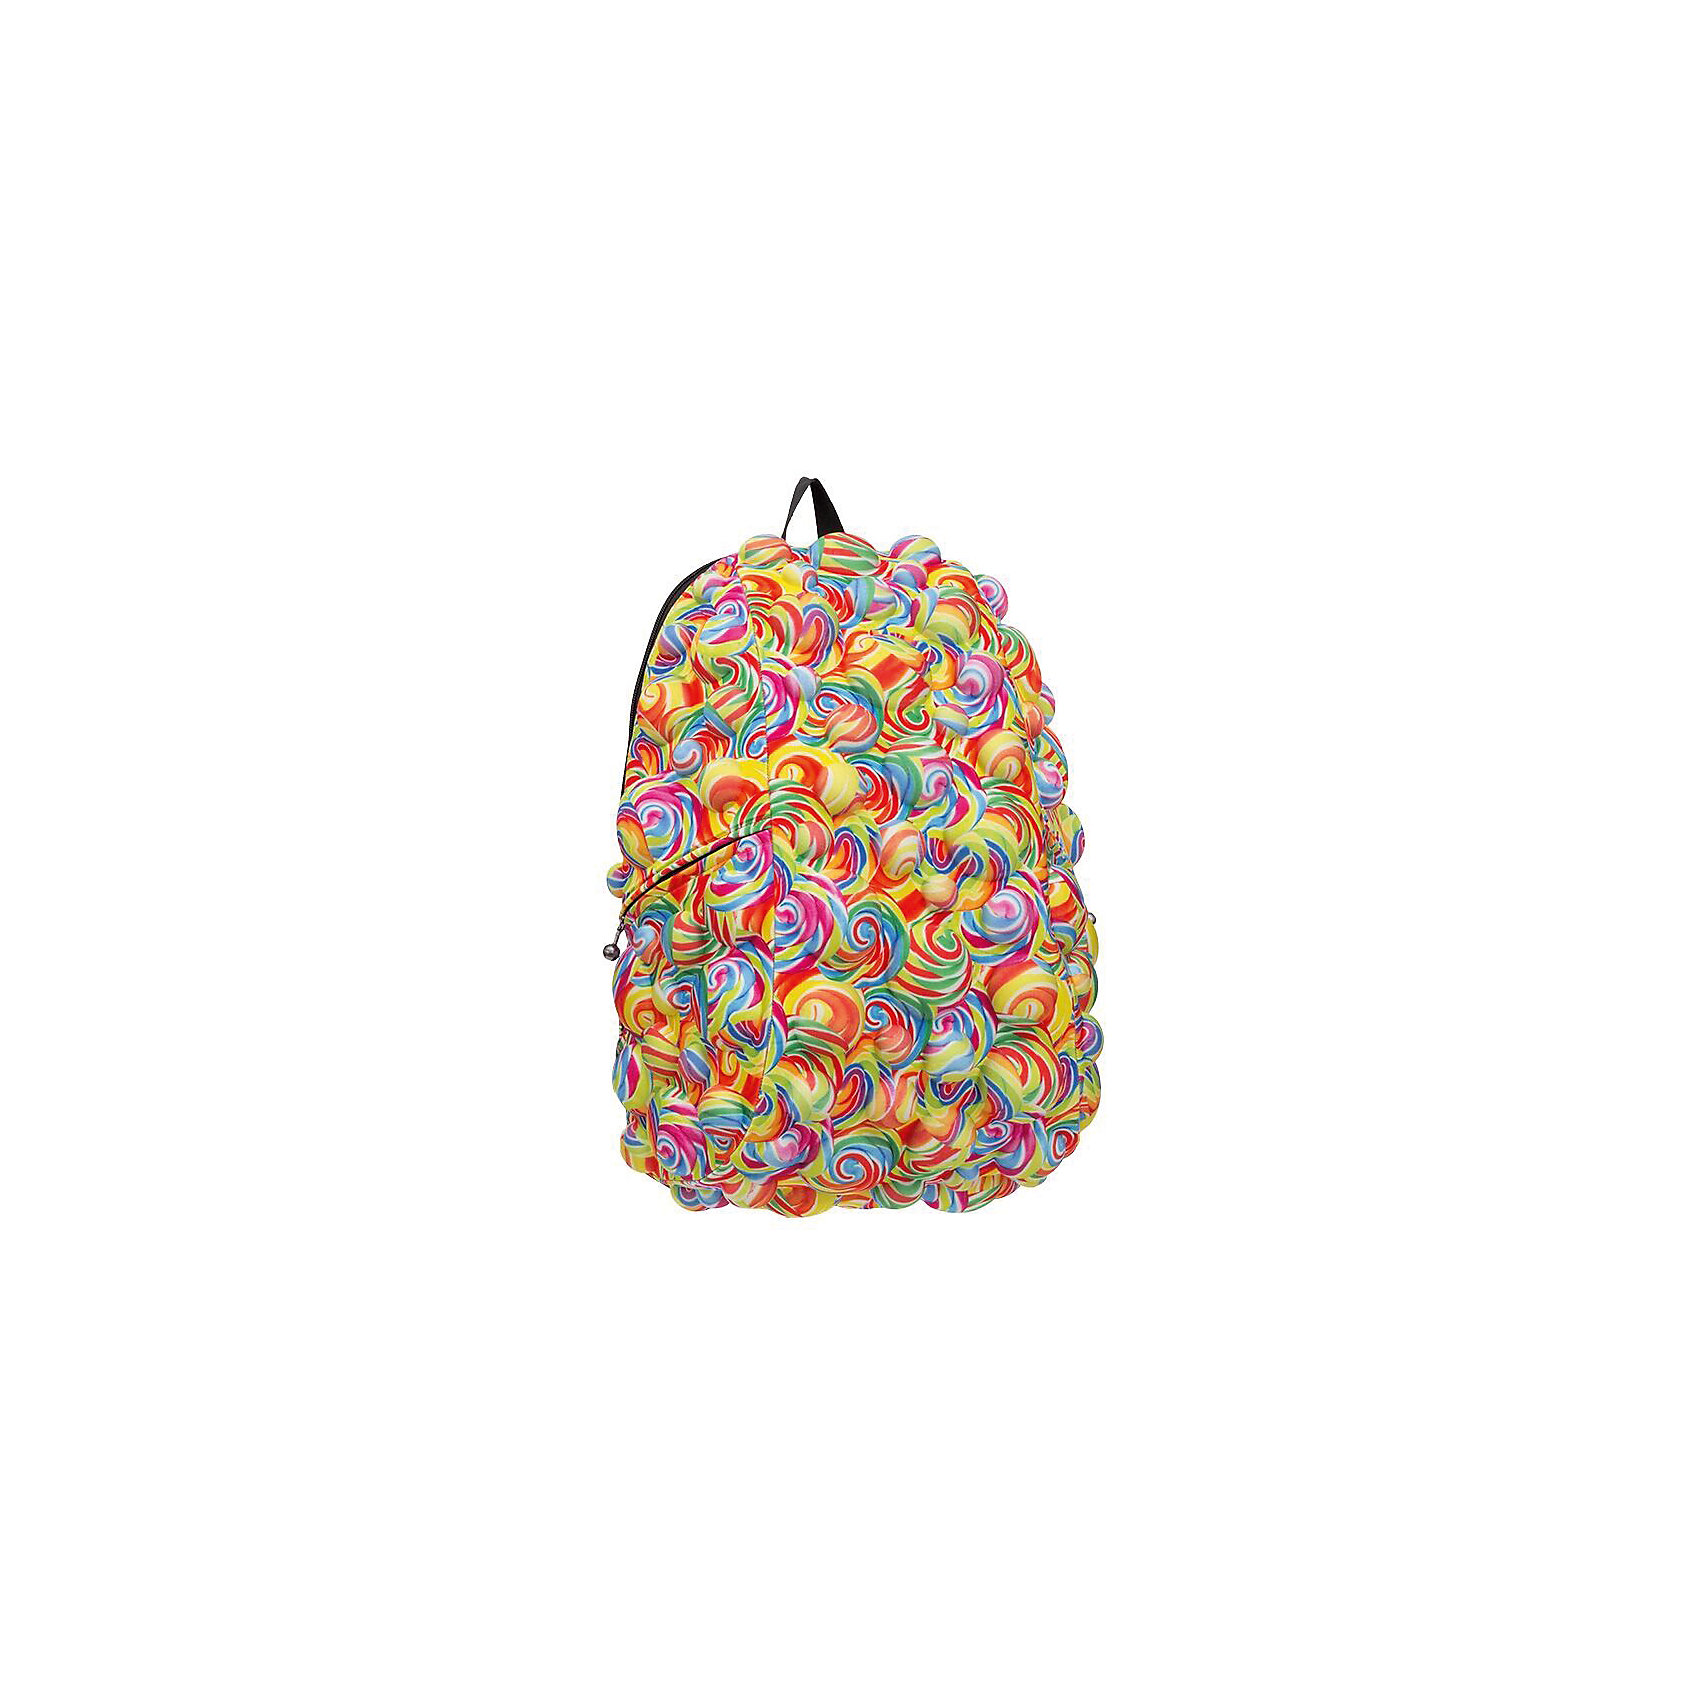 Рюкзак Bubble Full Lollipop, цвет мультиРюкзаки<br>Вес: 0,8 кг<br>Размер: 46х36х20 см<br>Состав: рюкзак<br>Наличие светоотражающих элементов: нет<br>Материал: полиспандекс<br><br>Ширина мм: 460<br>Глубина мм: 360<br>Высота мм: 200<br>Вес г: 800<br>Возраст от месяцев: 60<br>Возраст до месяцев: 720<br>Пол: Унисекс<br>Возраст: Детский<br>SKU: 7054055